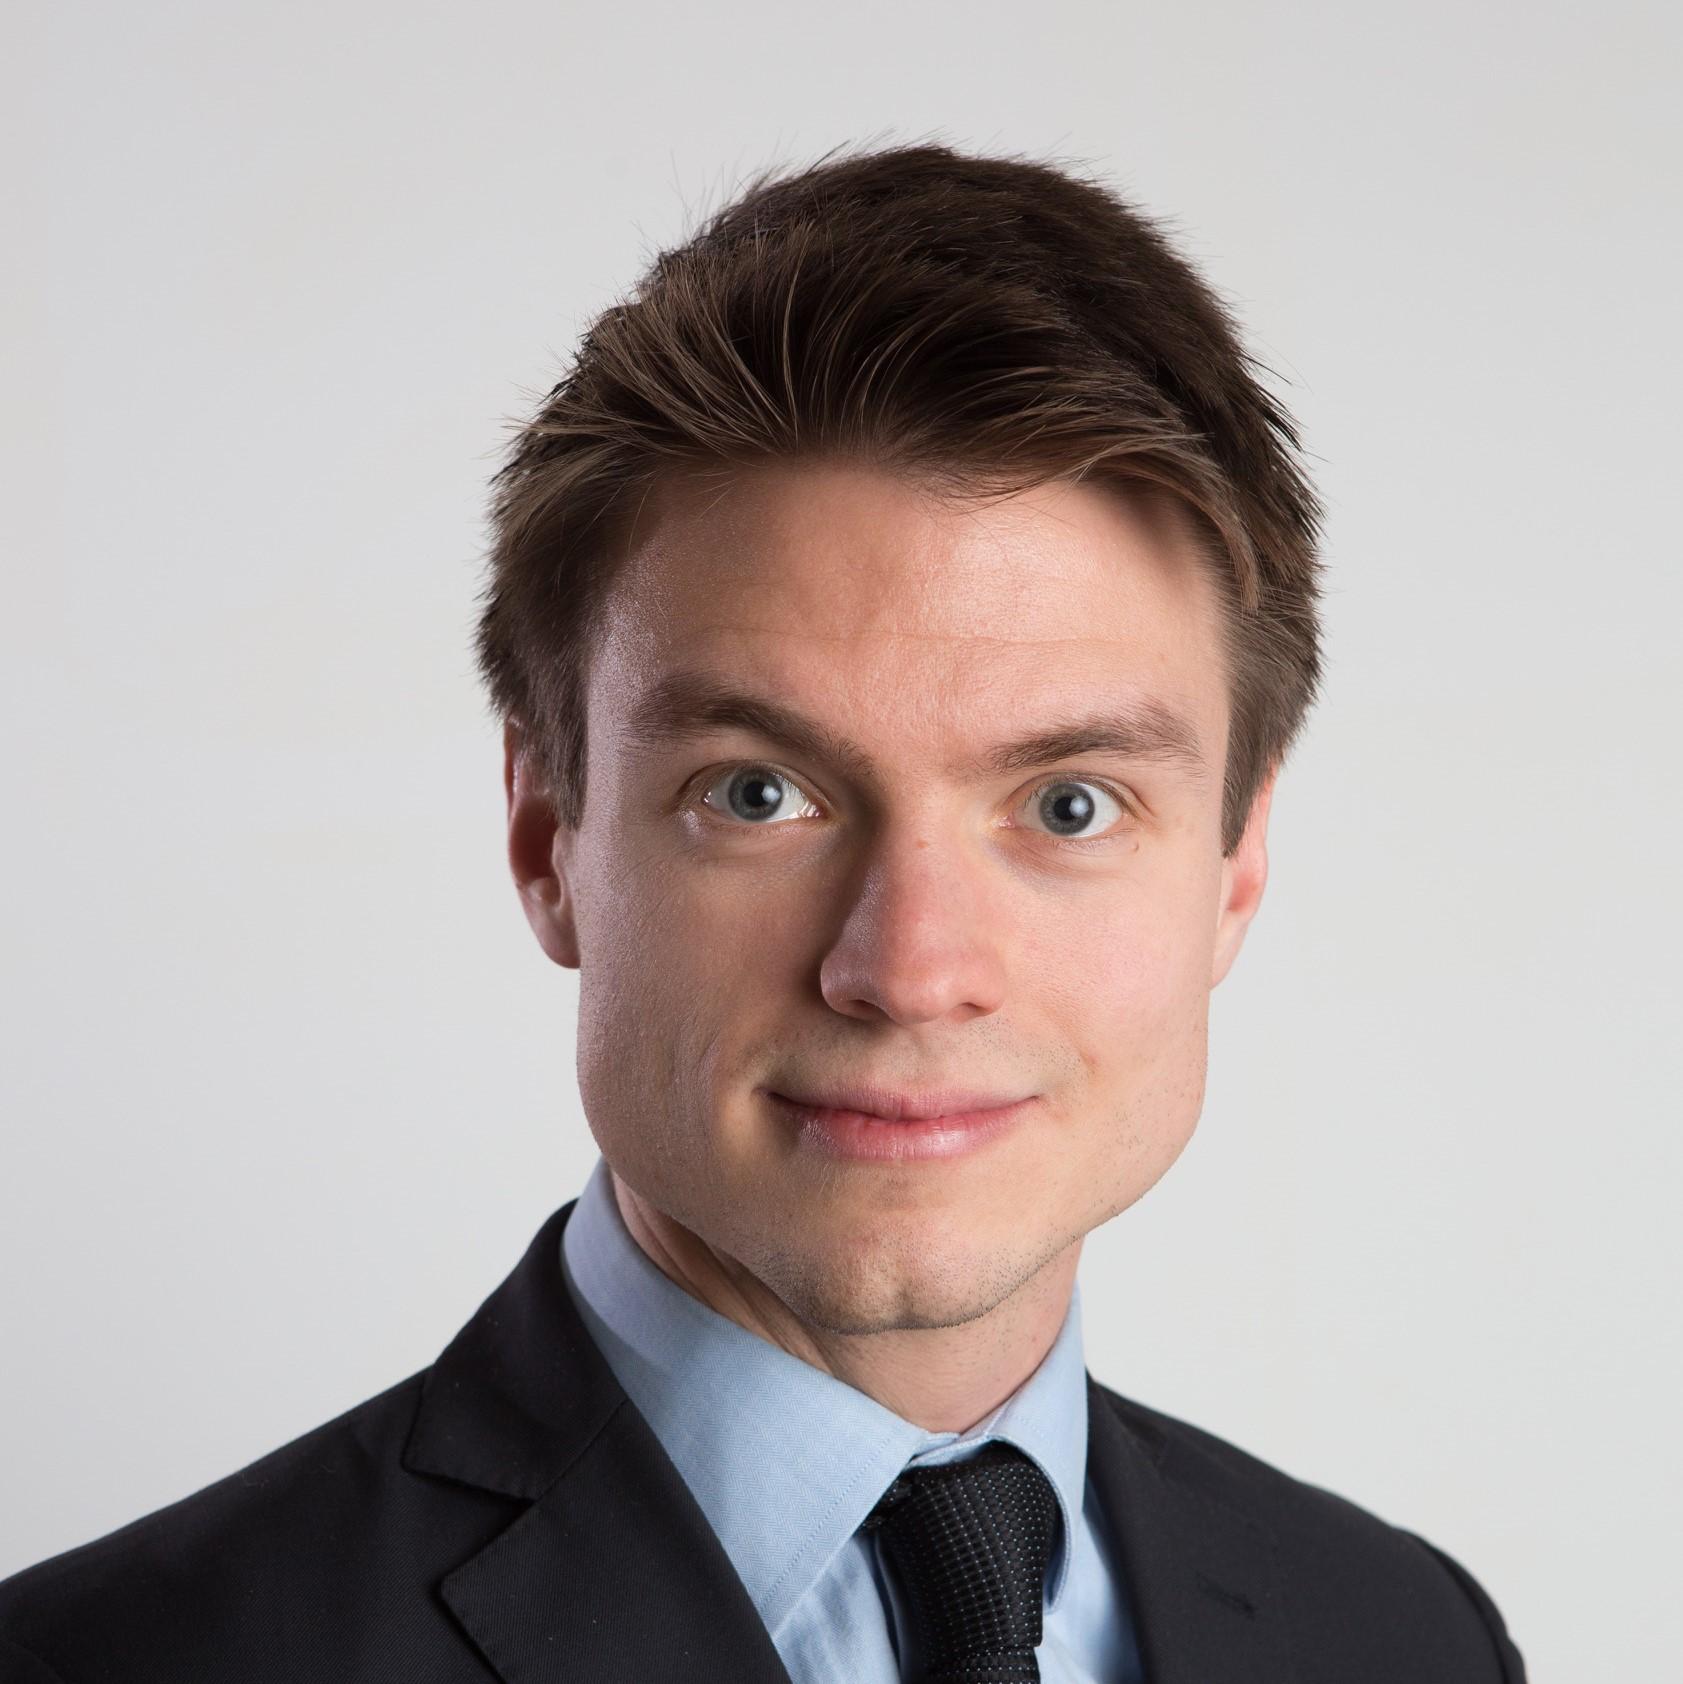 Nicolas Hamann